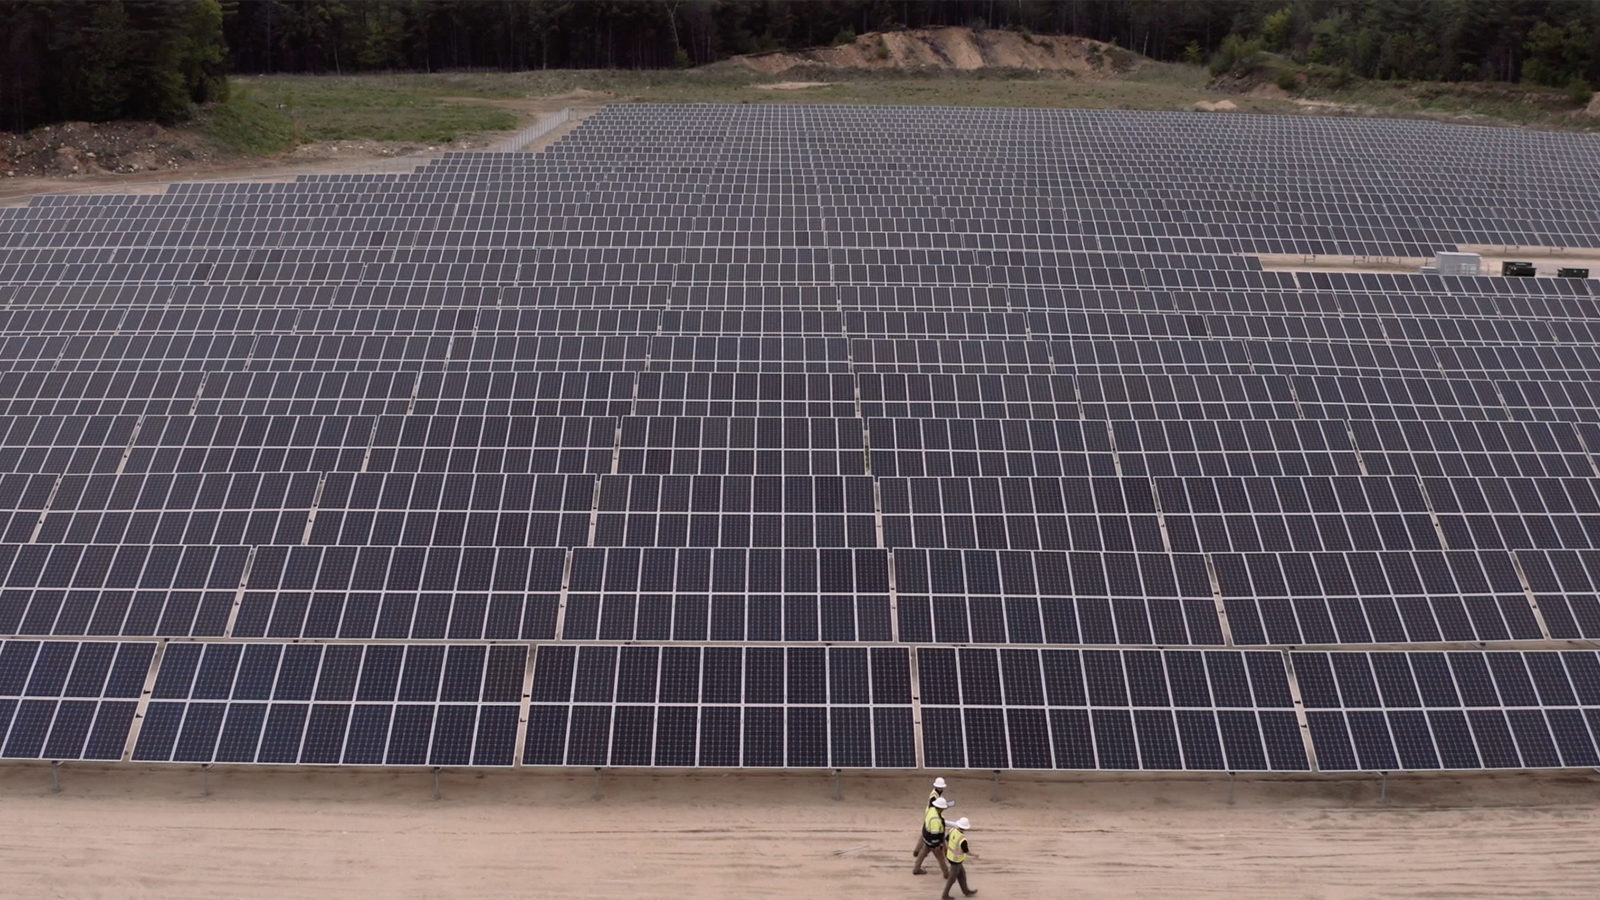 Nautilus, Borrego Working Toward 17.2 MW of Community Solar